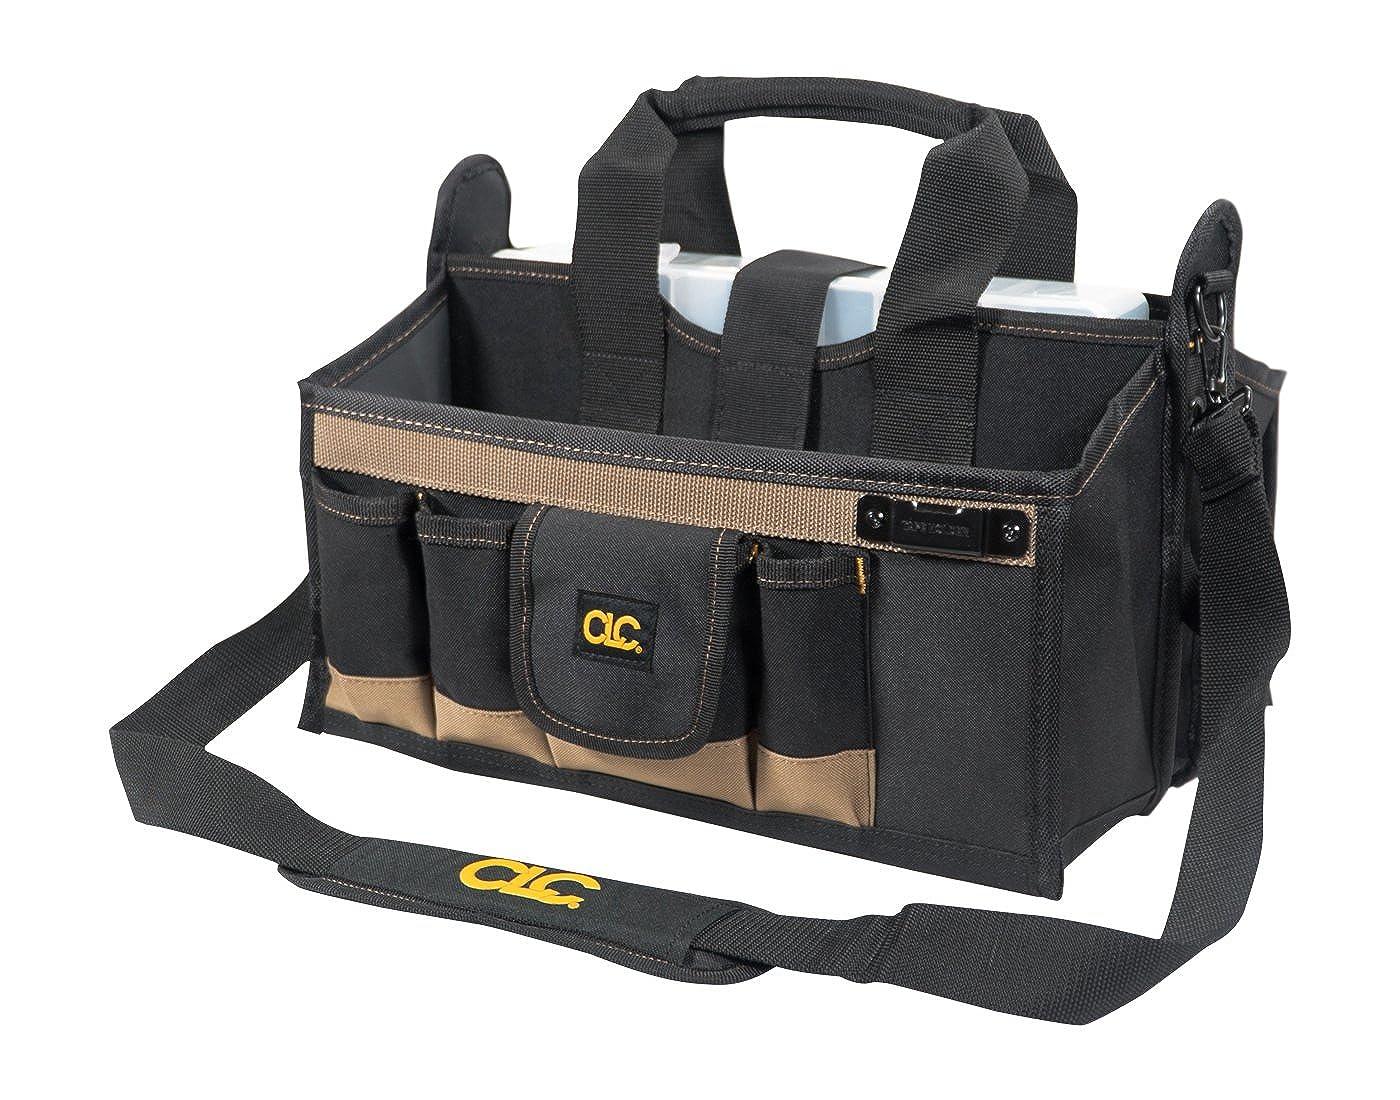 Custom Leathercraft 15 Pocket 16 in. Center Tray Tool Bag